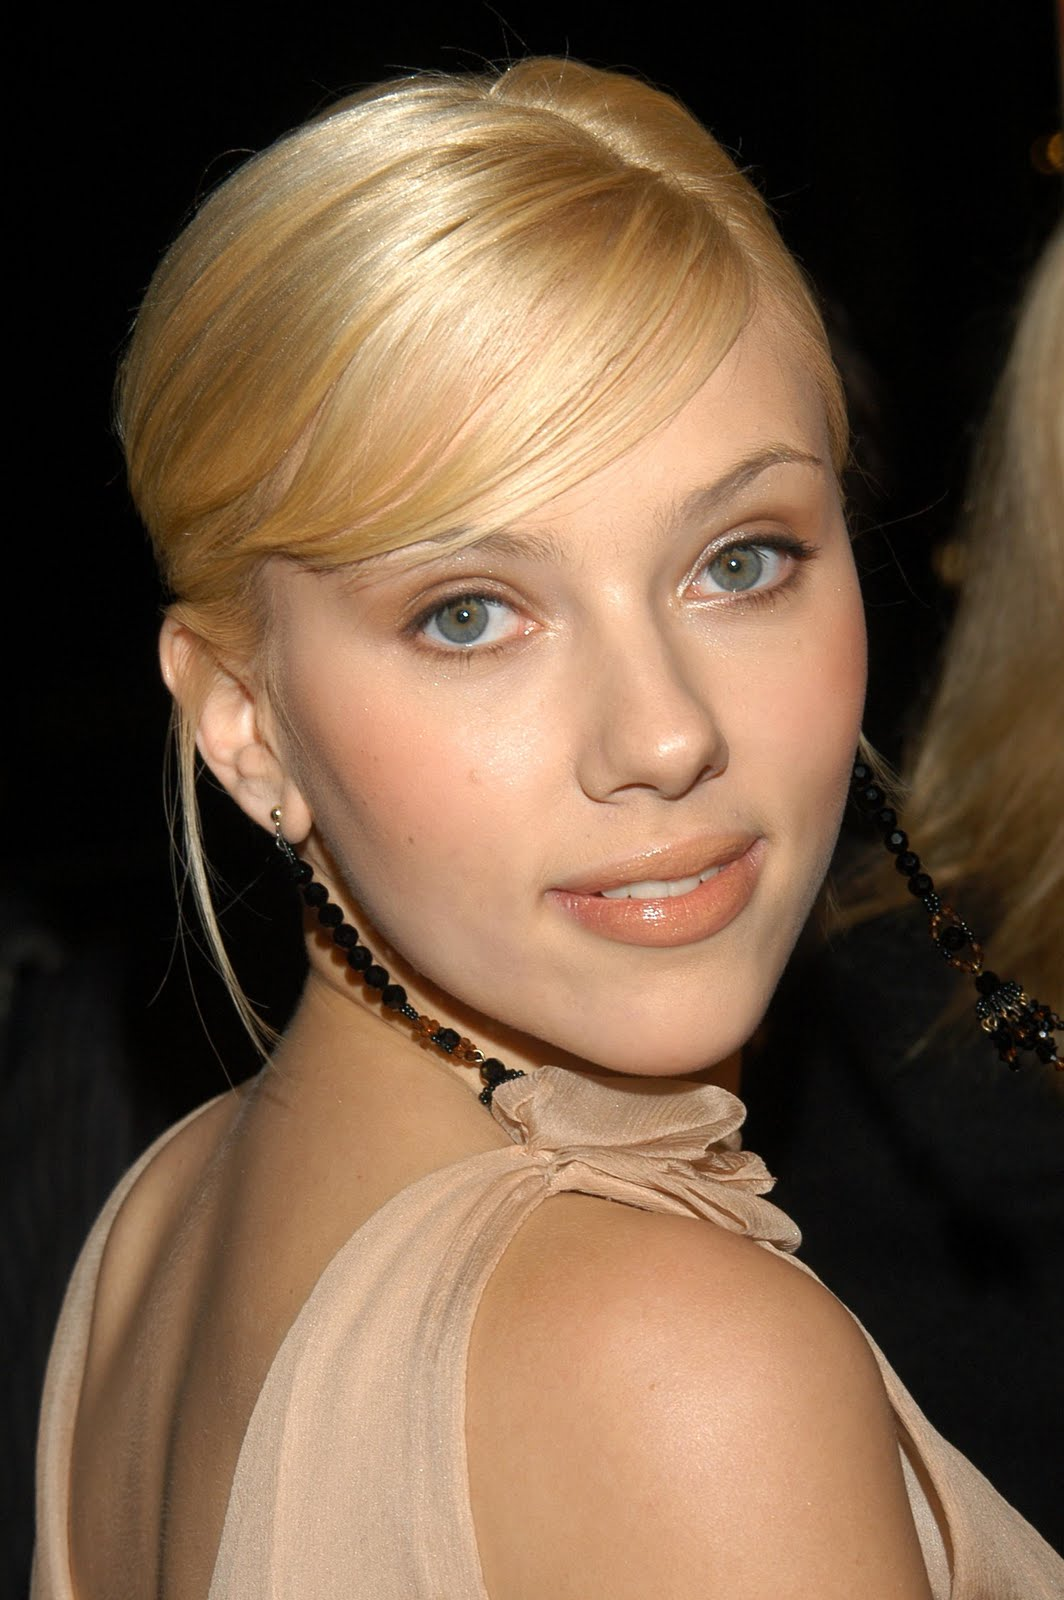 Scarlett Young